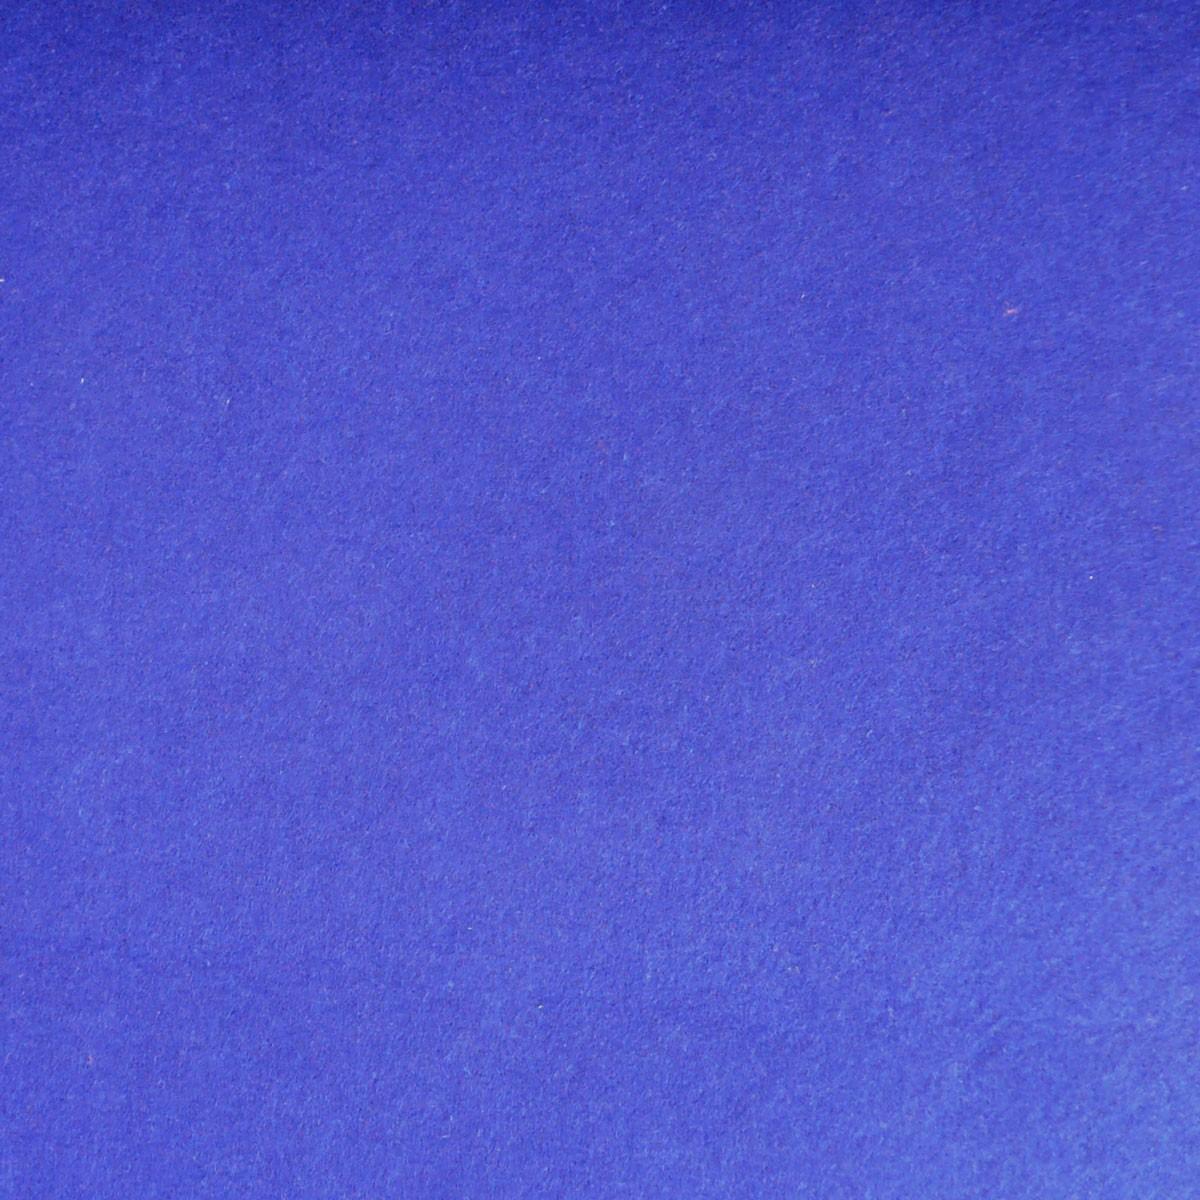 Kreativstoff Bastelfilz einfarbig royalblau 45cm Breite 4mm Stärke